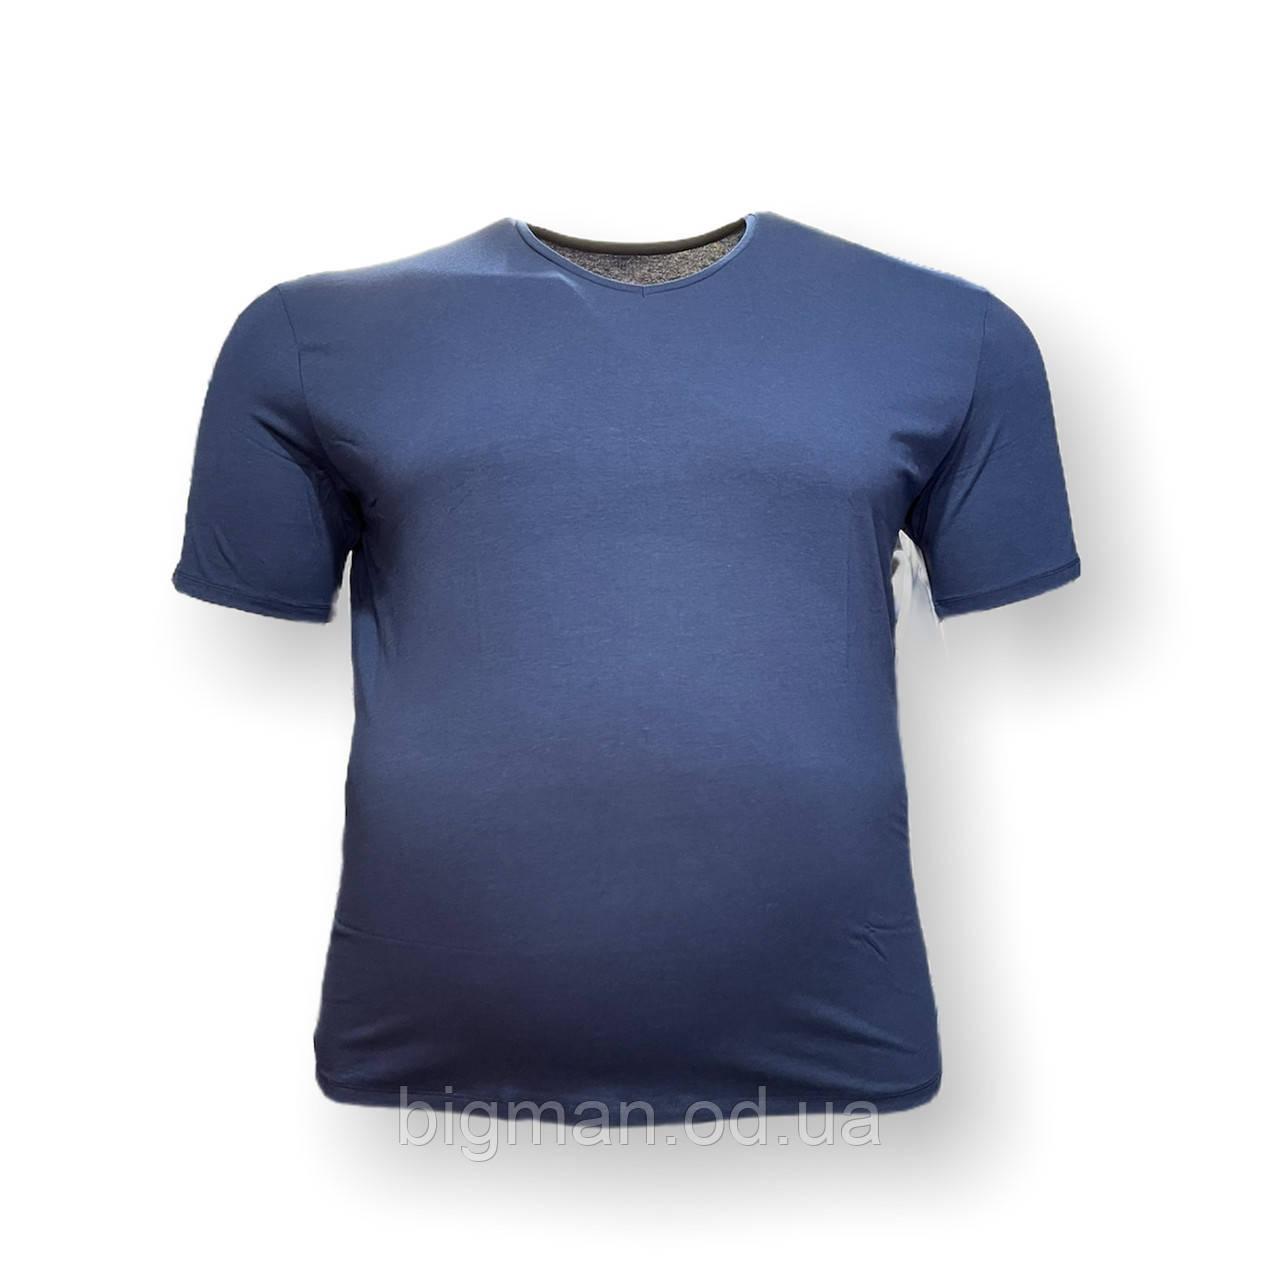 Мужская батальная футболка DioRise 12111 3XL 4XL 5XL 6XL 7XL синяя большие размеры Турция